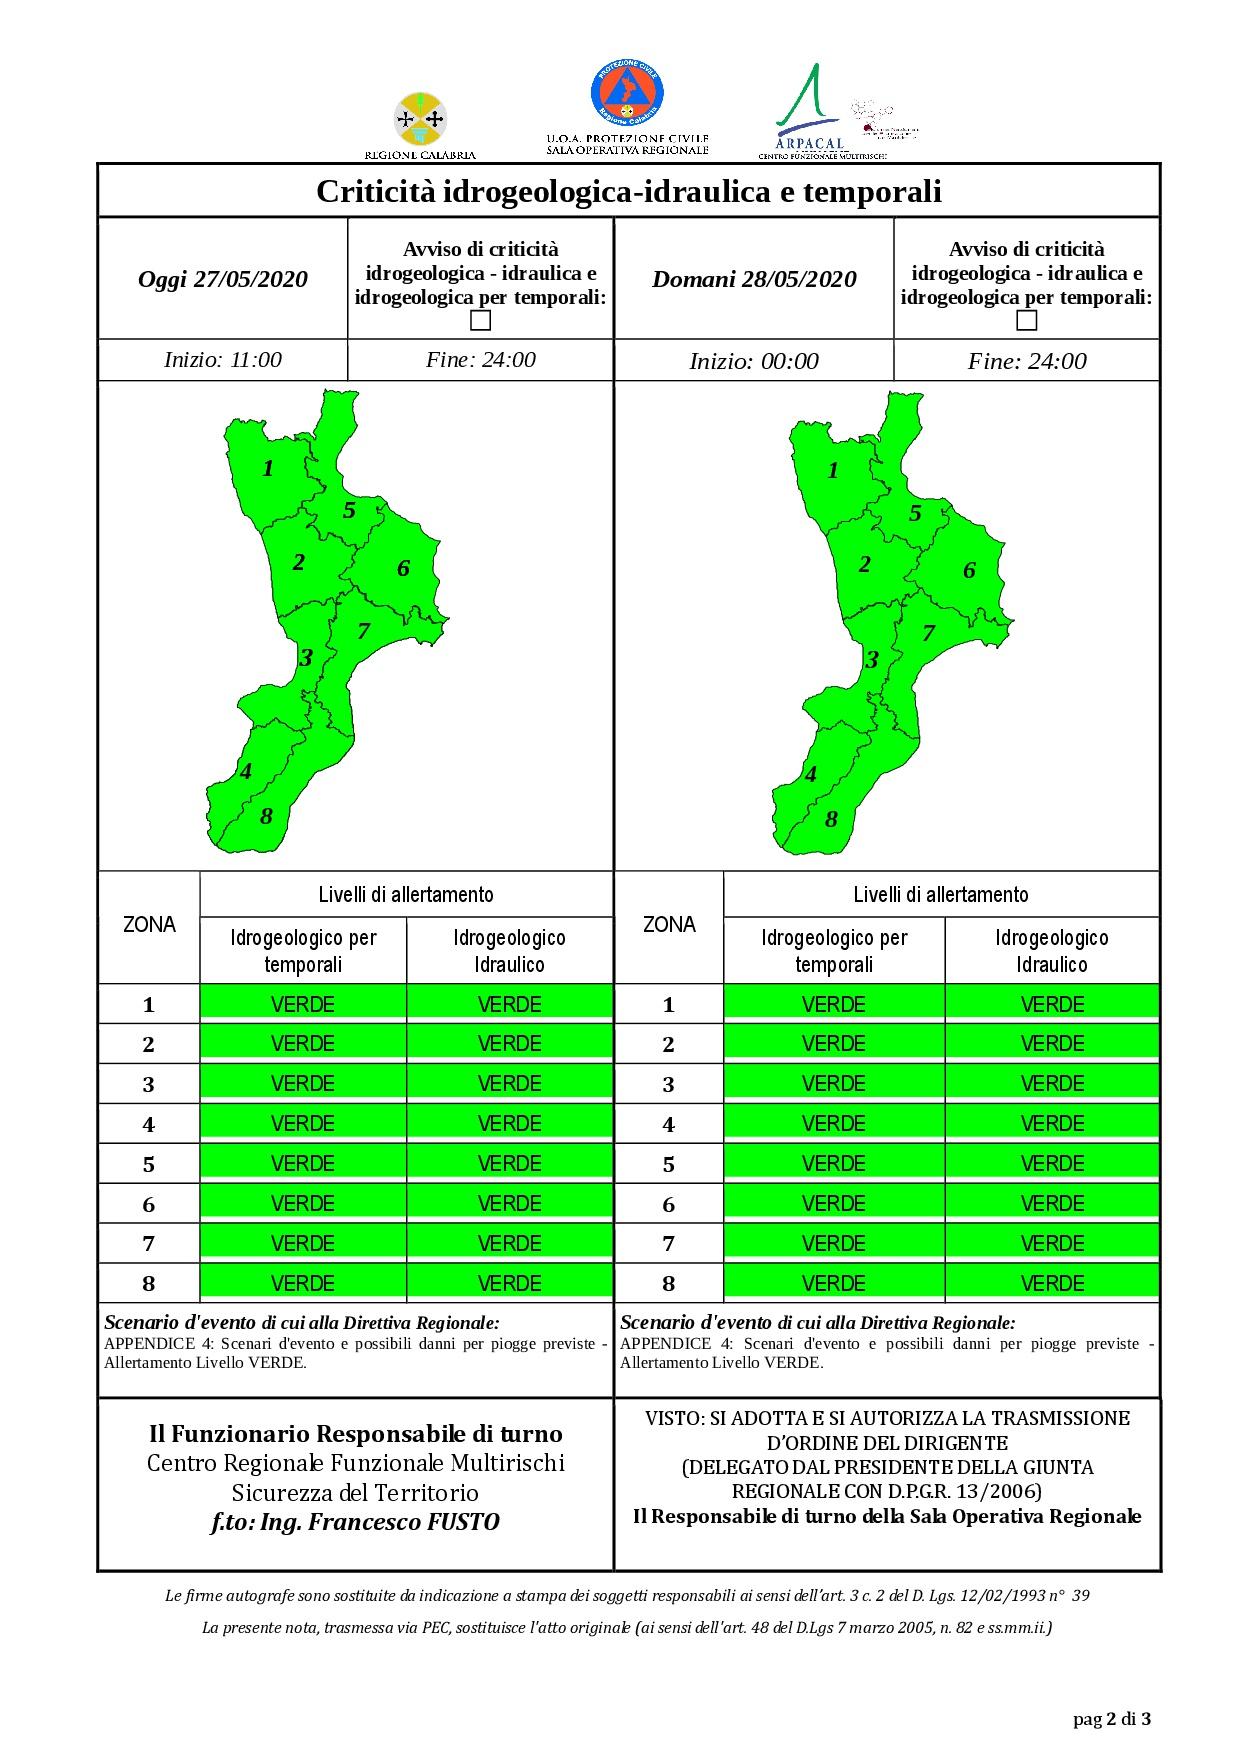 Criticità idrogeologica-idraulica e temporali in Calabria 27-05-2020